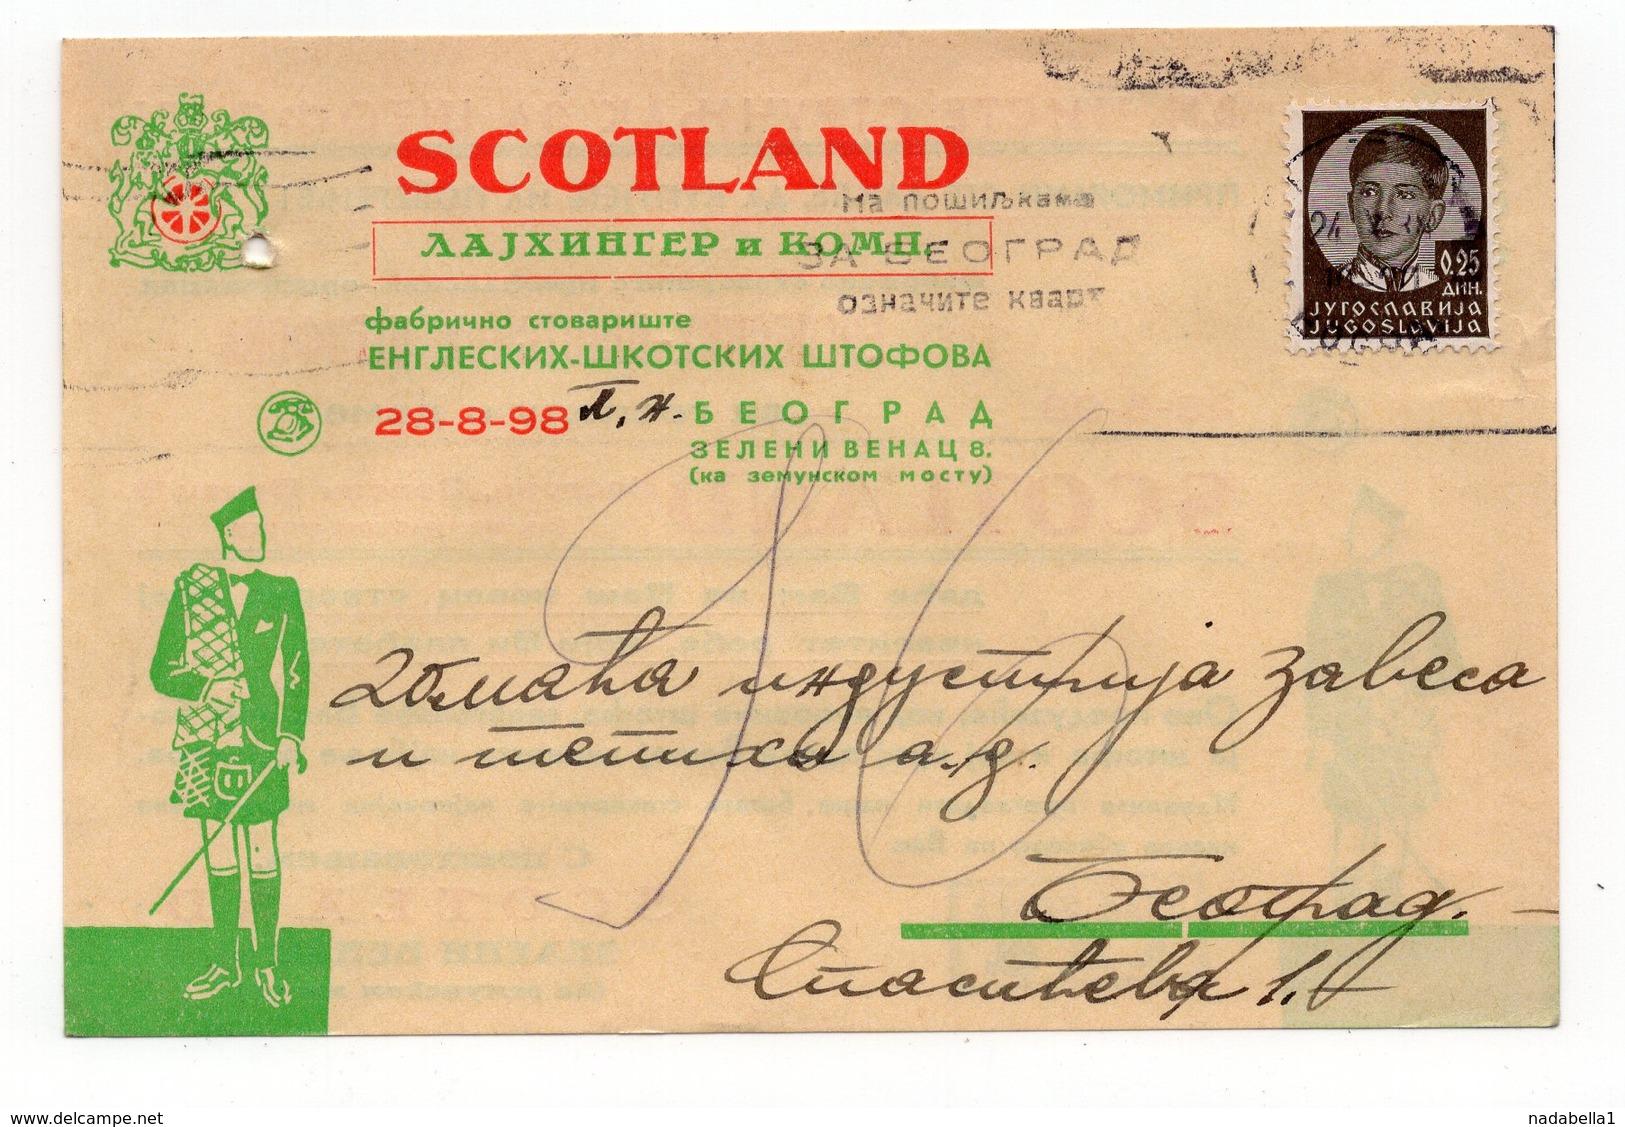 1938,YUGOSLAVIA, SERBIA, BELGRADE, SCOTLAND, CORRESPONDENCE CARD, FLAM: MARK THE MAIL FOR BELGRADE DELIVERY - Covers & Documents